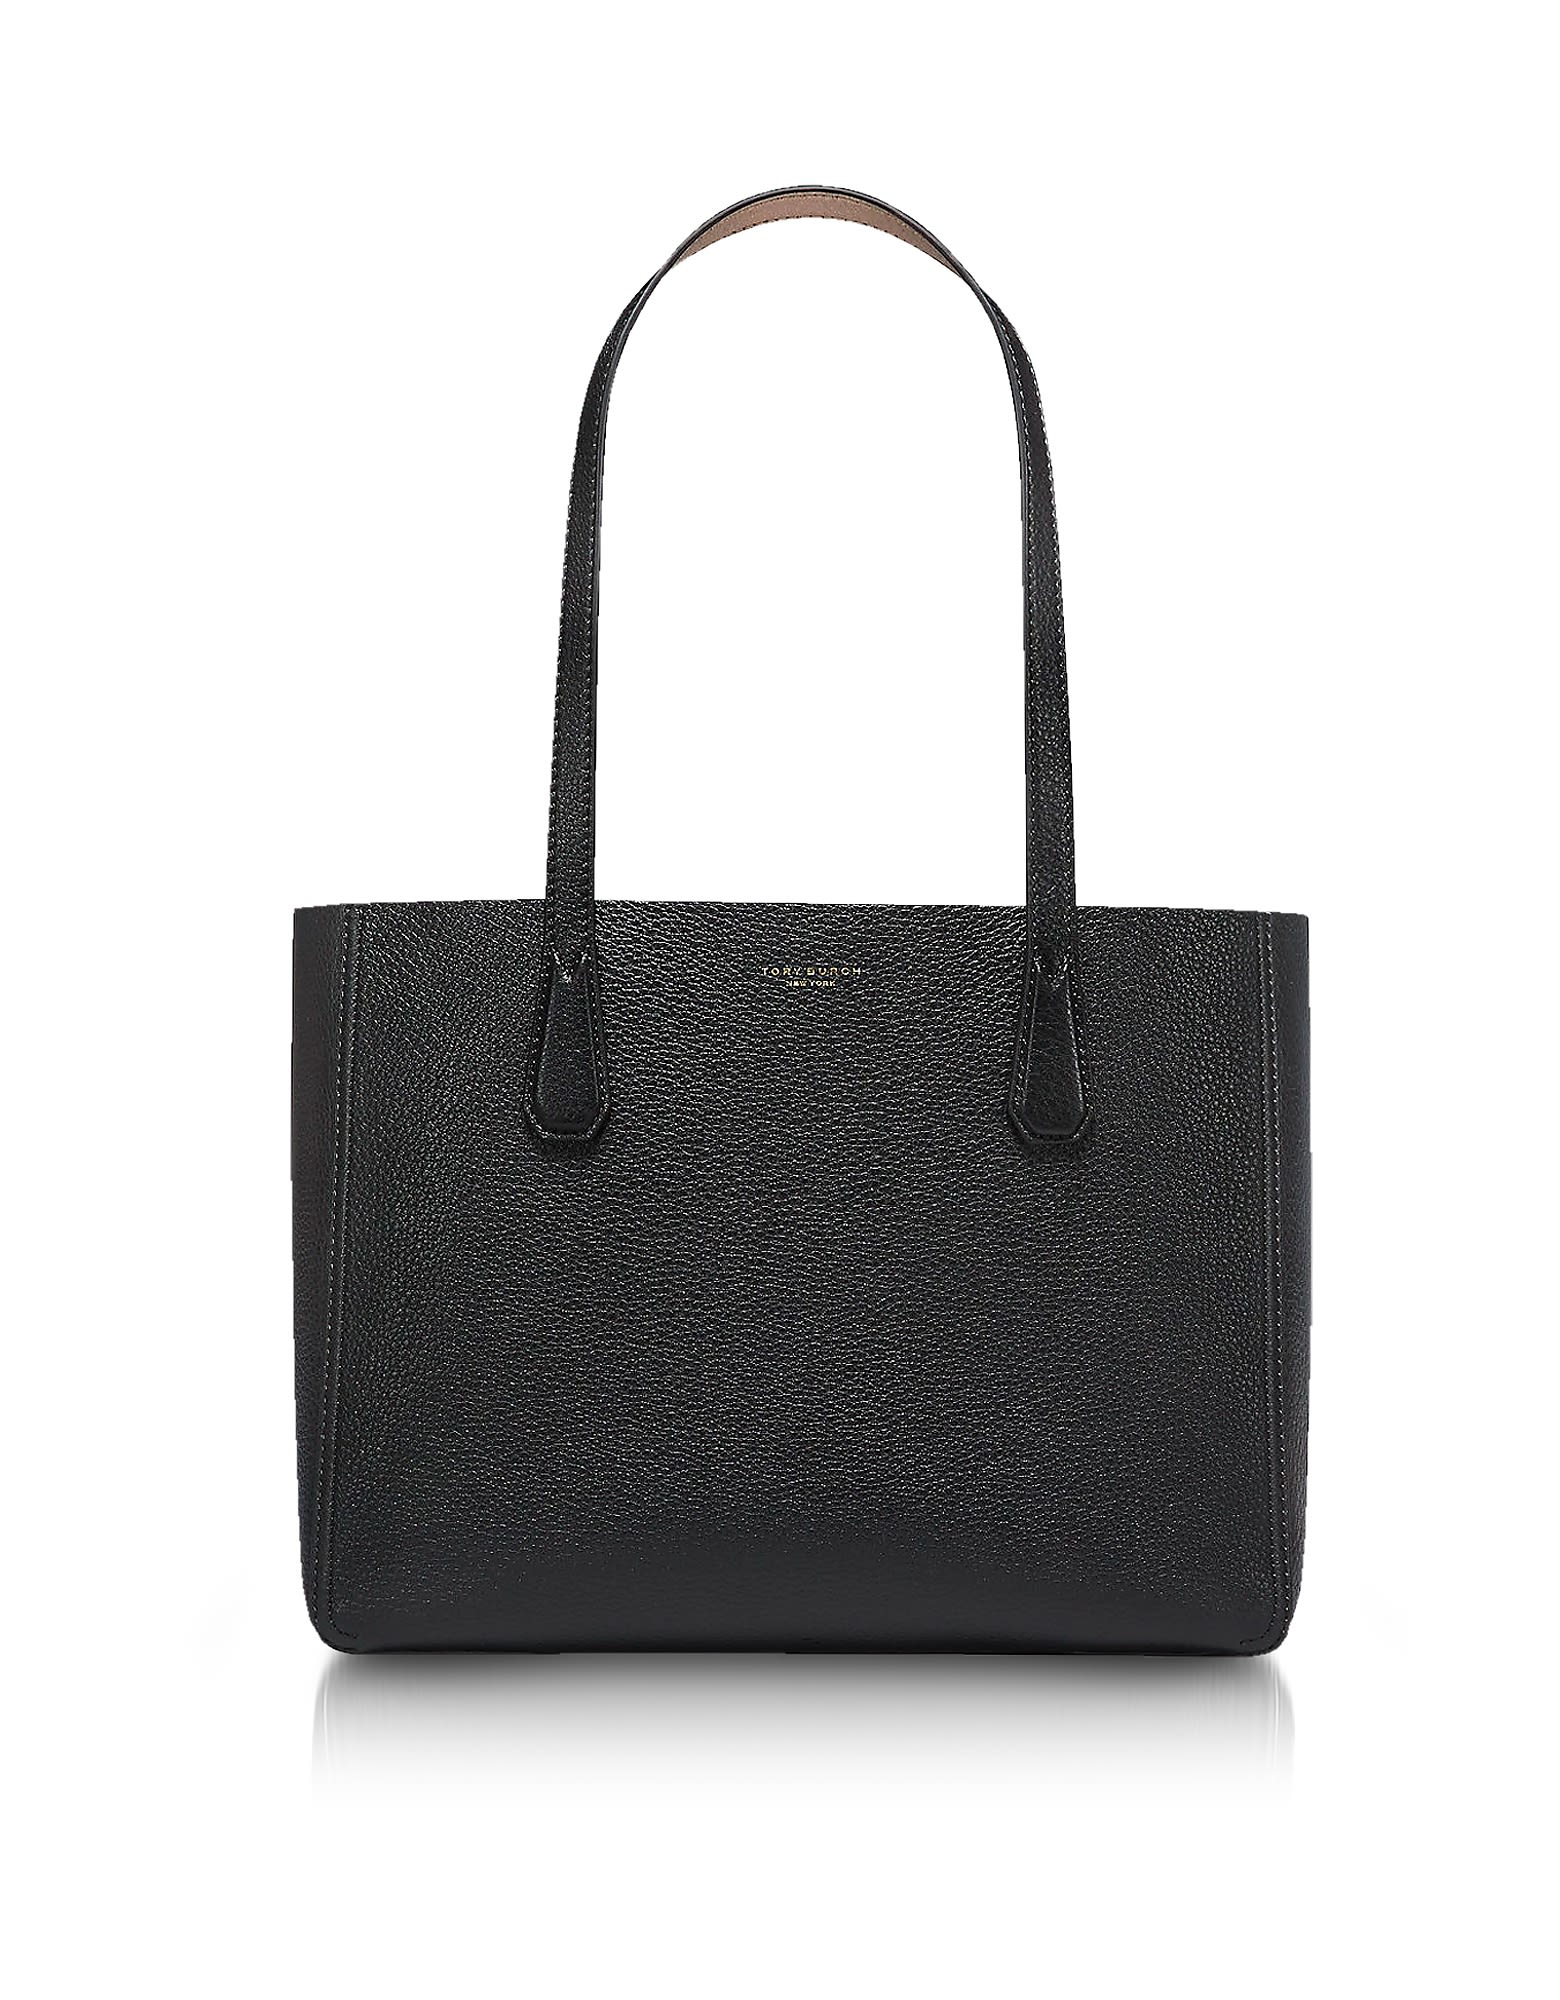 Phoebe Black/Metallic Gold Pebbled Leather Mini Tote Bag